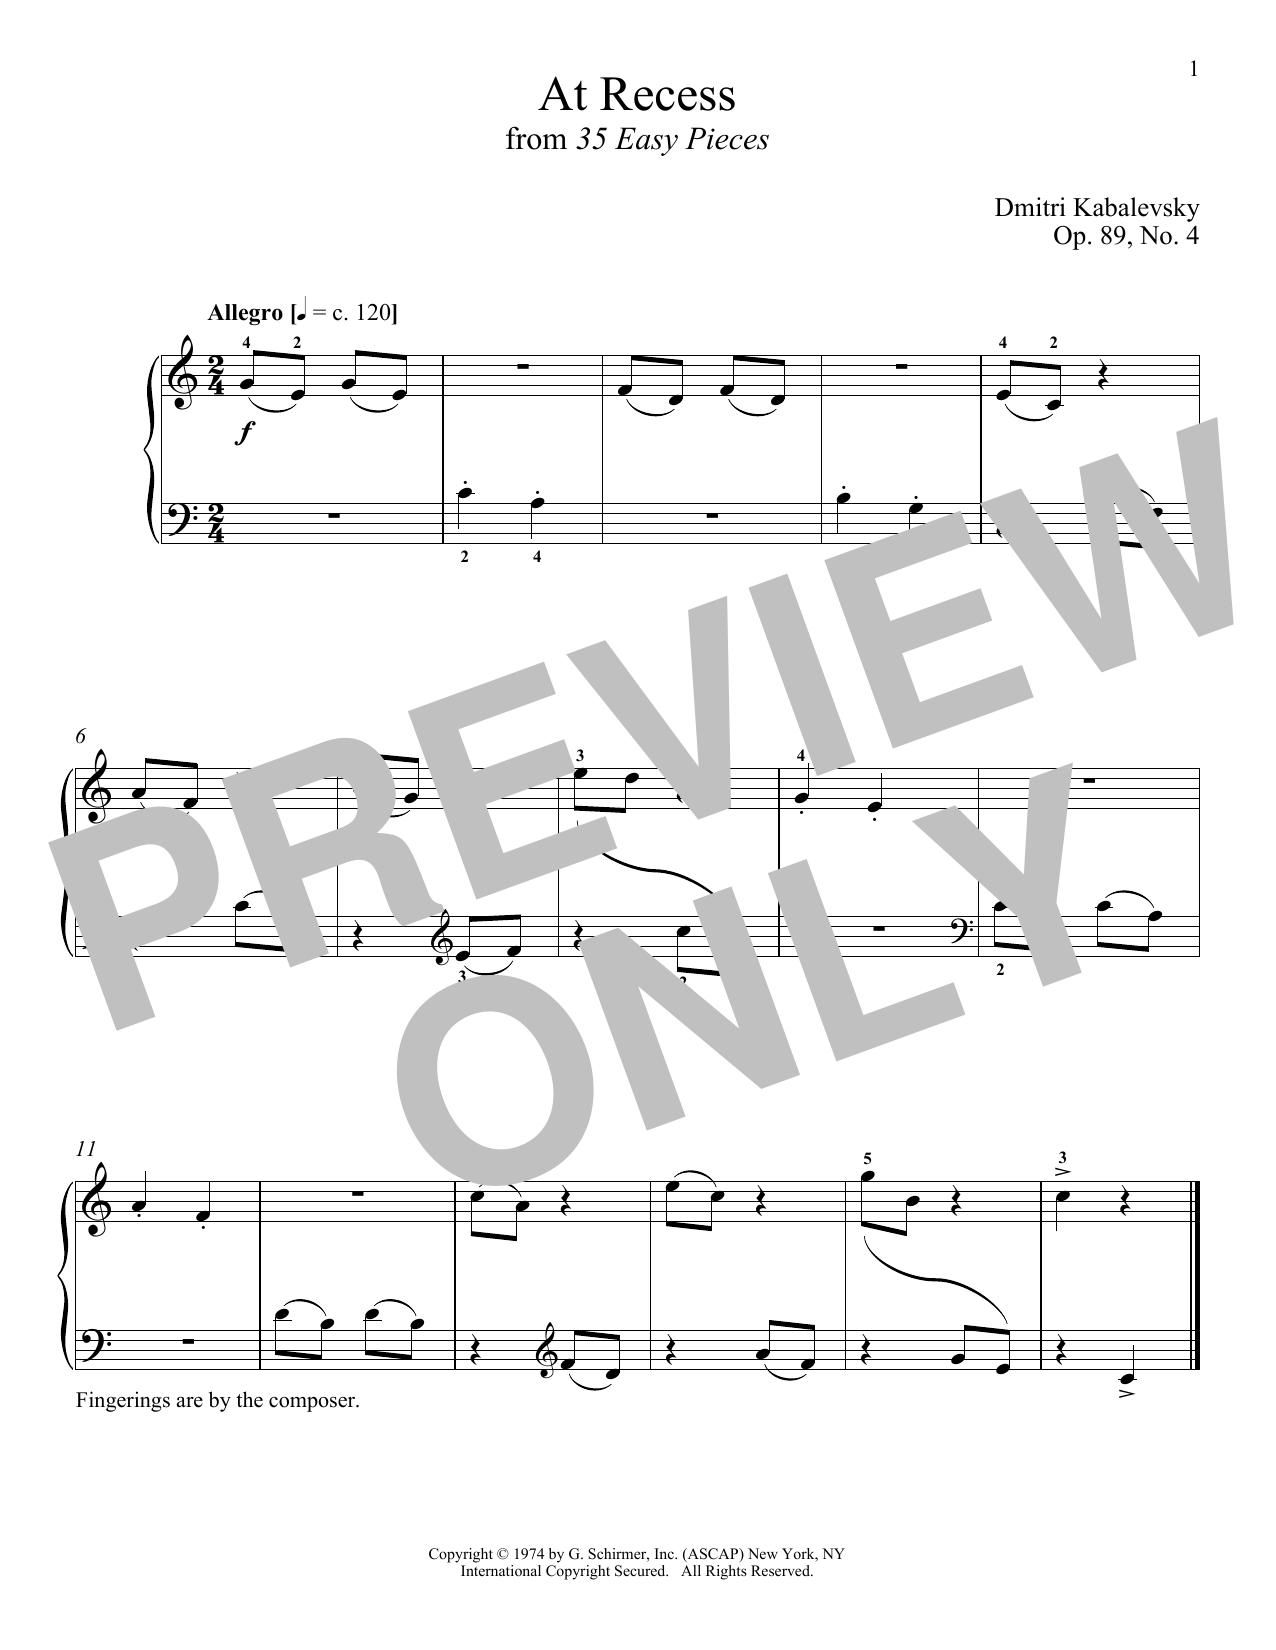 Dmitri Kabalevsky At Recess sheet music notes and chords. Download Printable PDF.